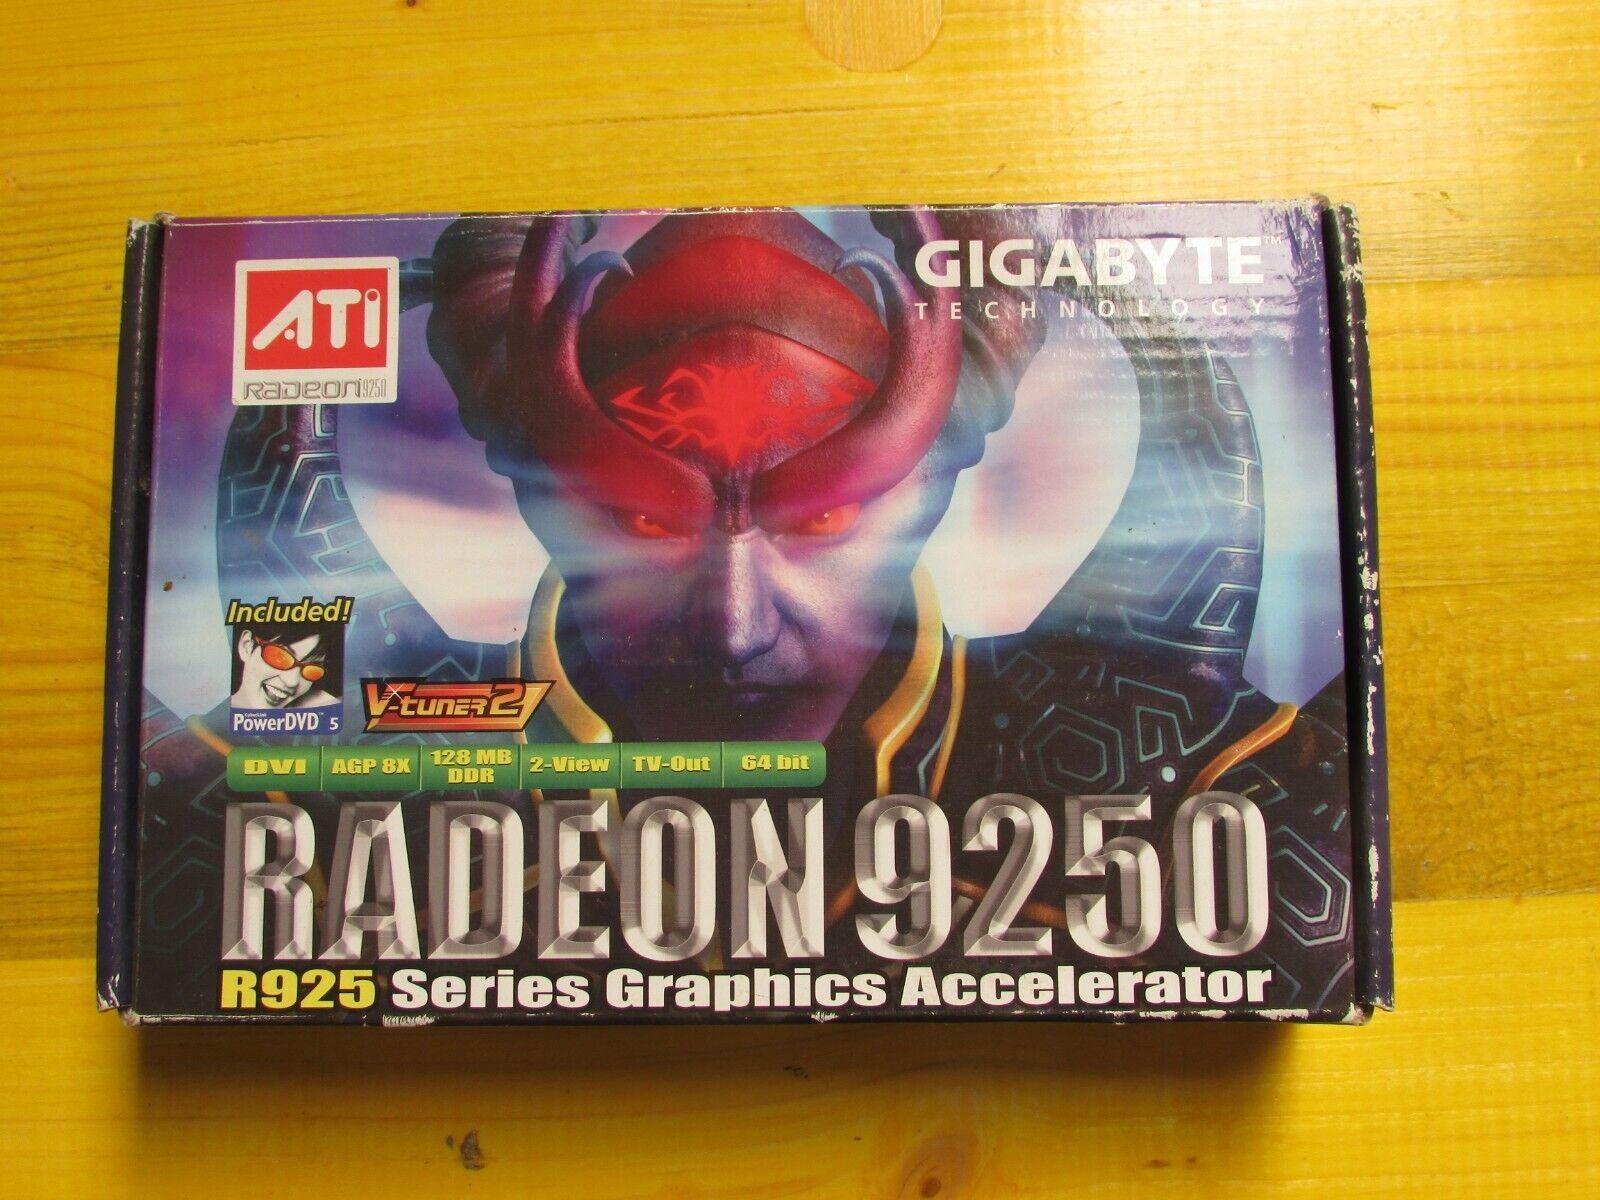 Scheda Video Radeon 9250 R925 series graphics Accelerator GigaByte teclonogy AT.